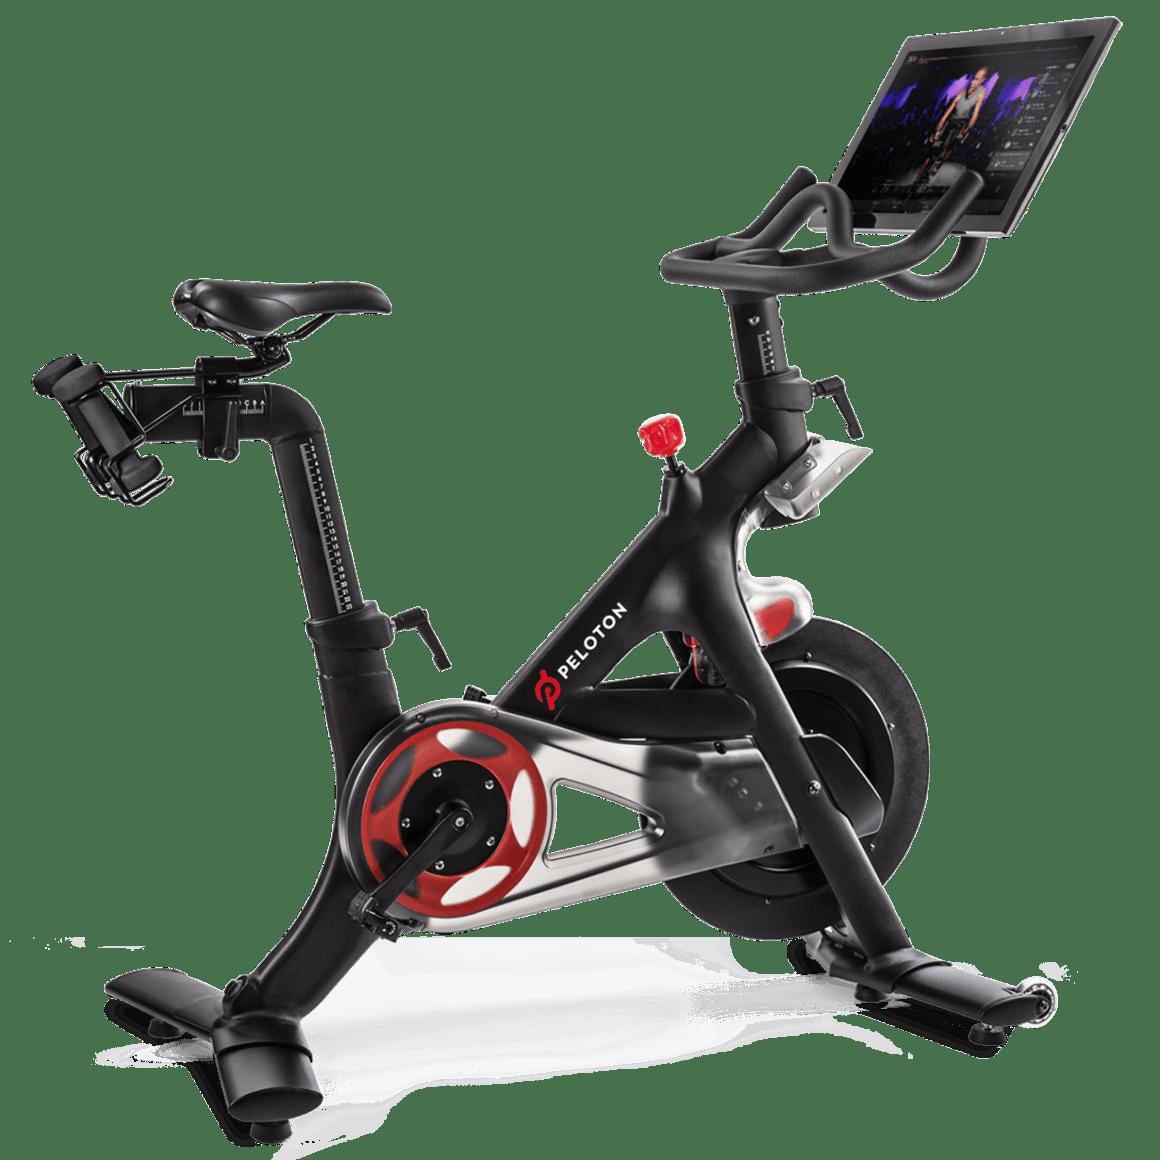 Peloton Bike Reviews - Model Closeup